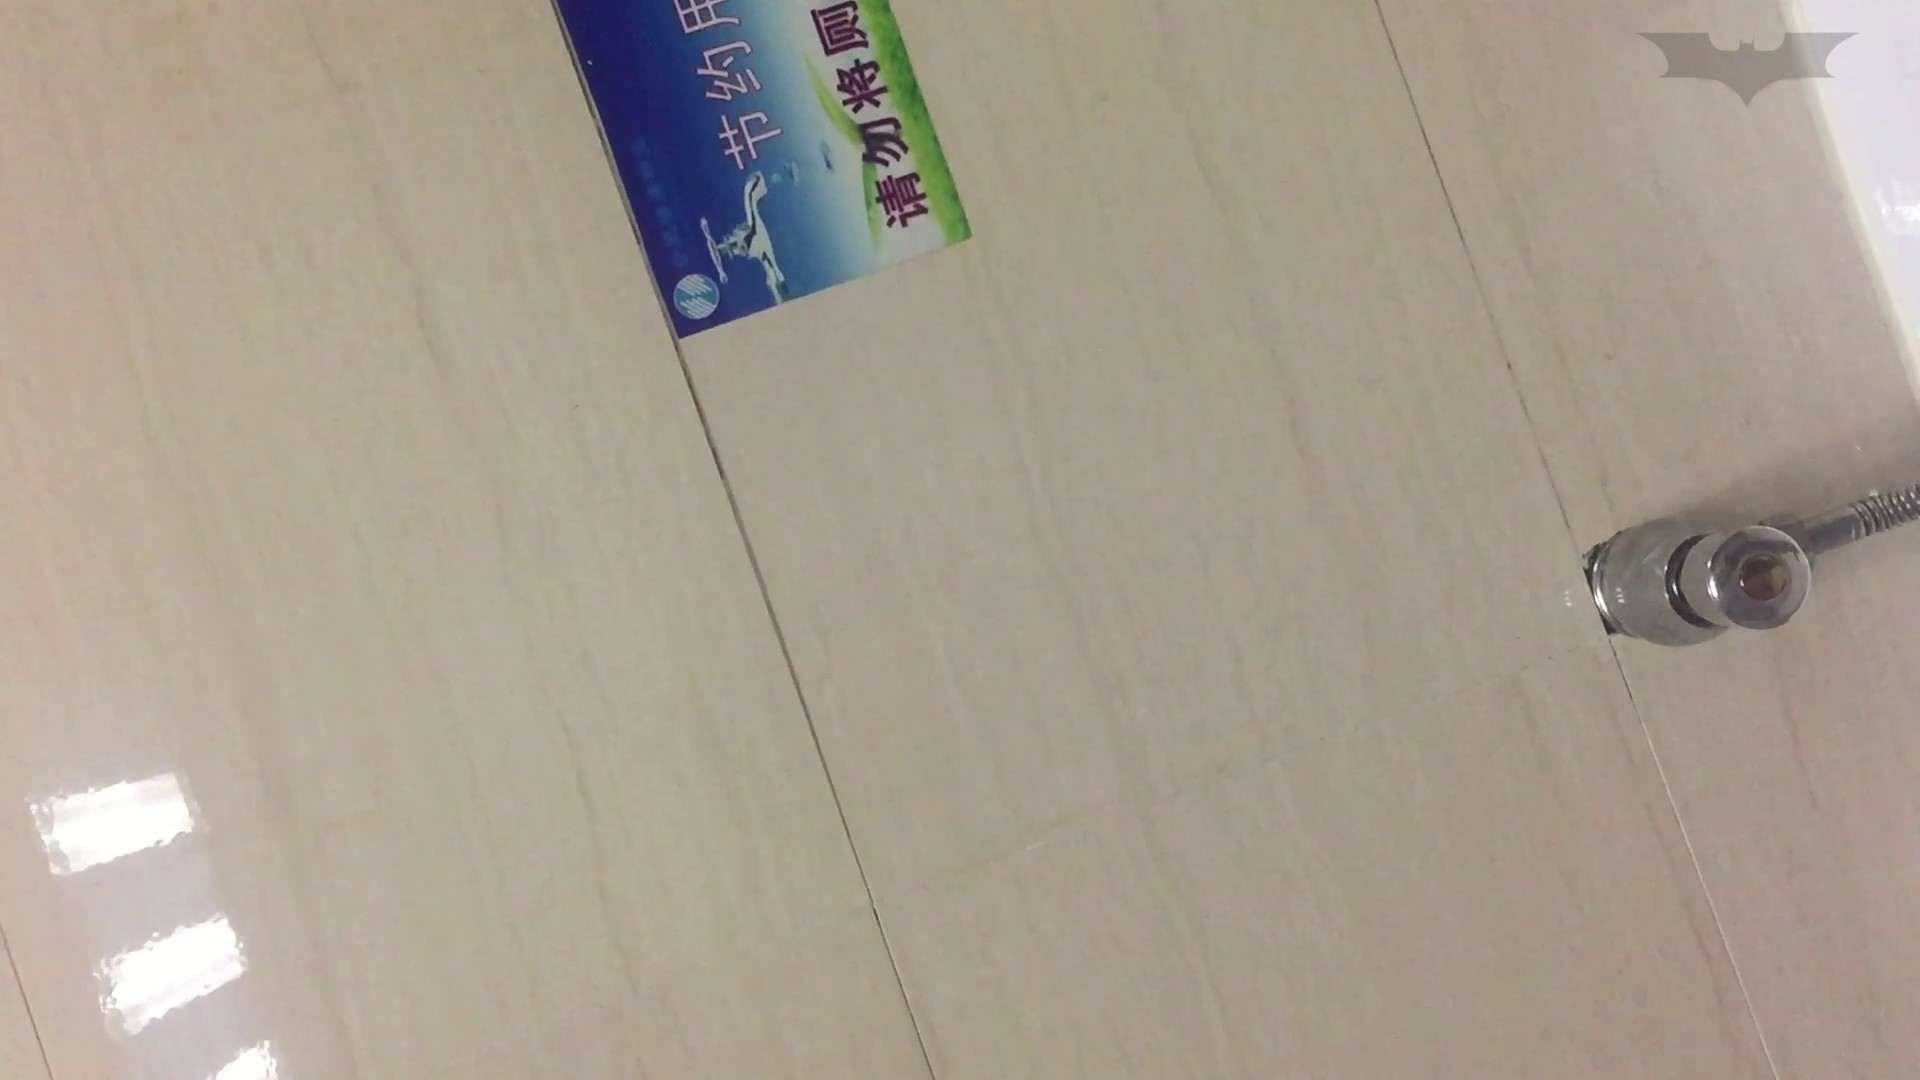 JD盗撮 美女の洗面所の秘密 Vol.72 細身女性 ぱこり動画紹介 74画像 50